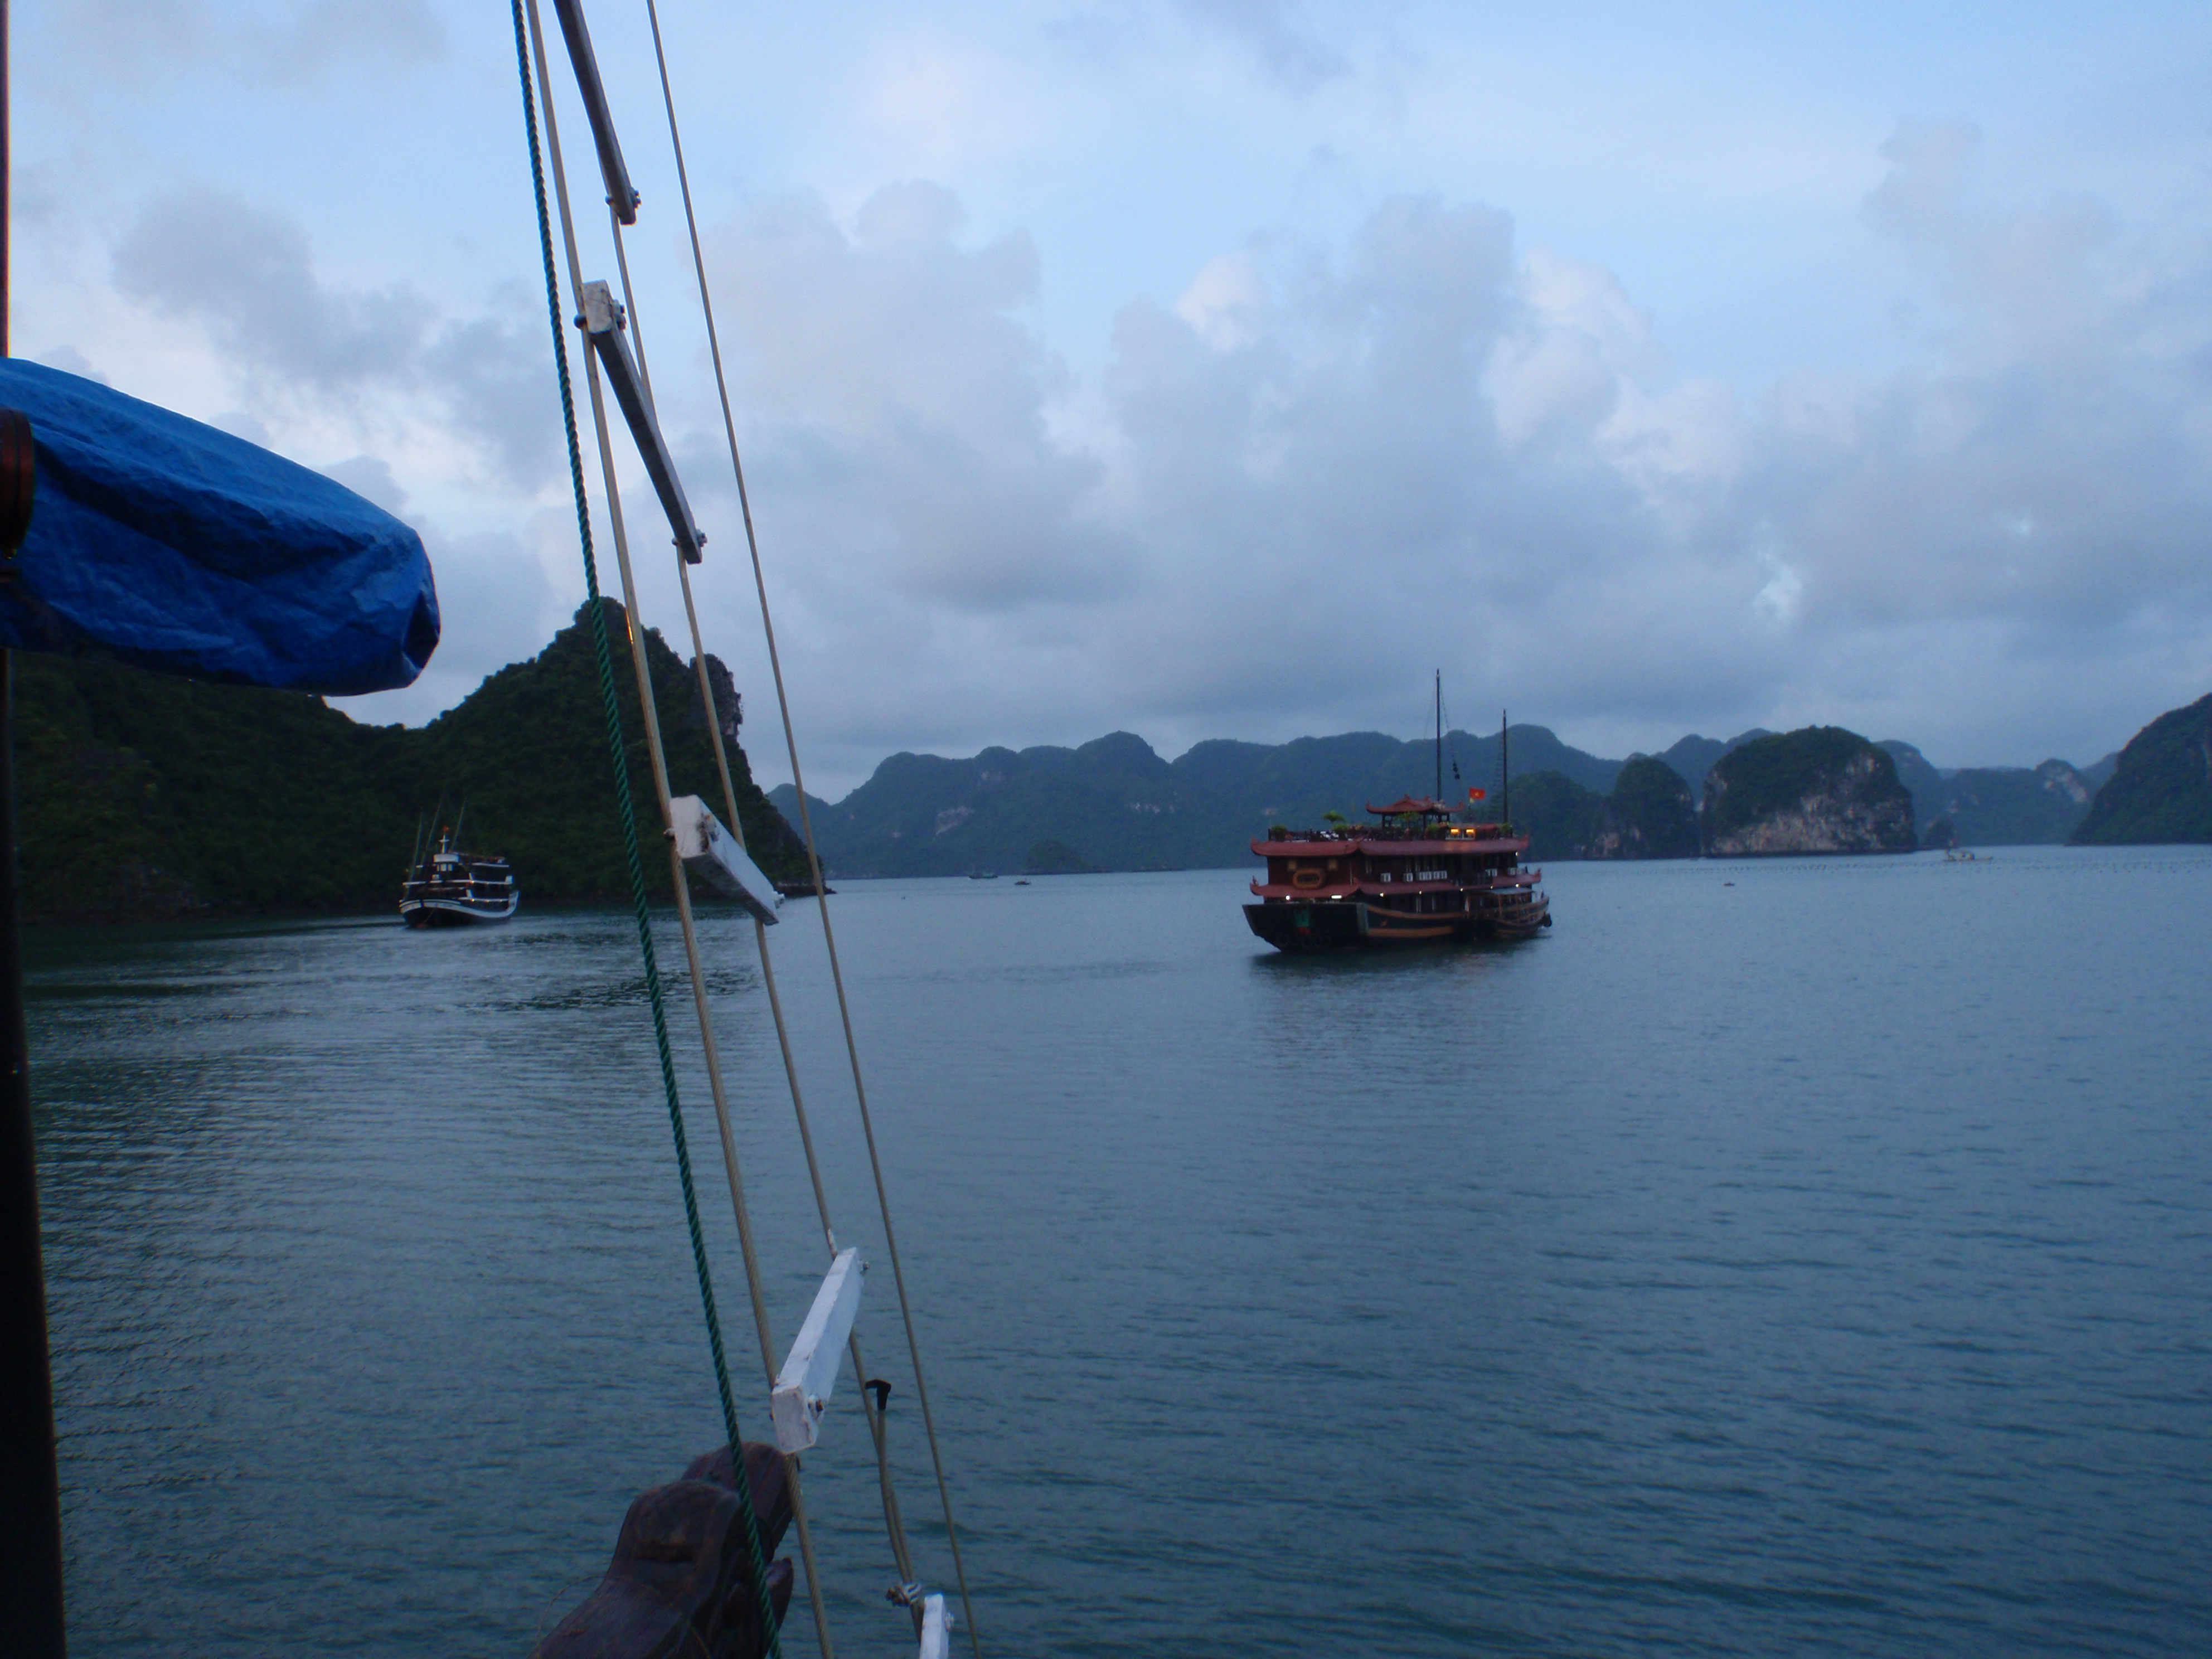 A procession of Junk boats